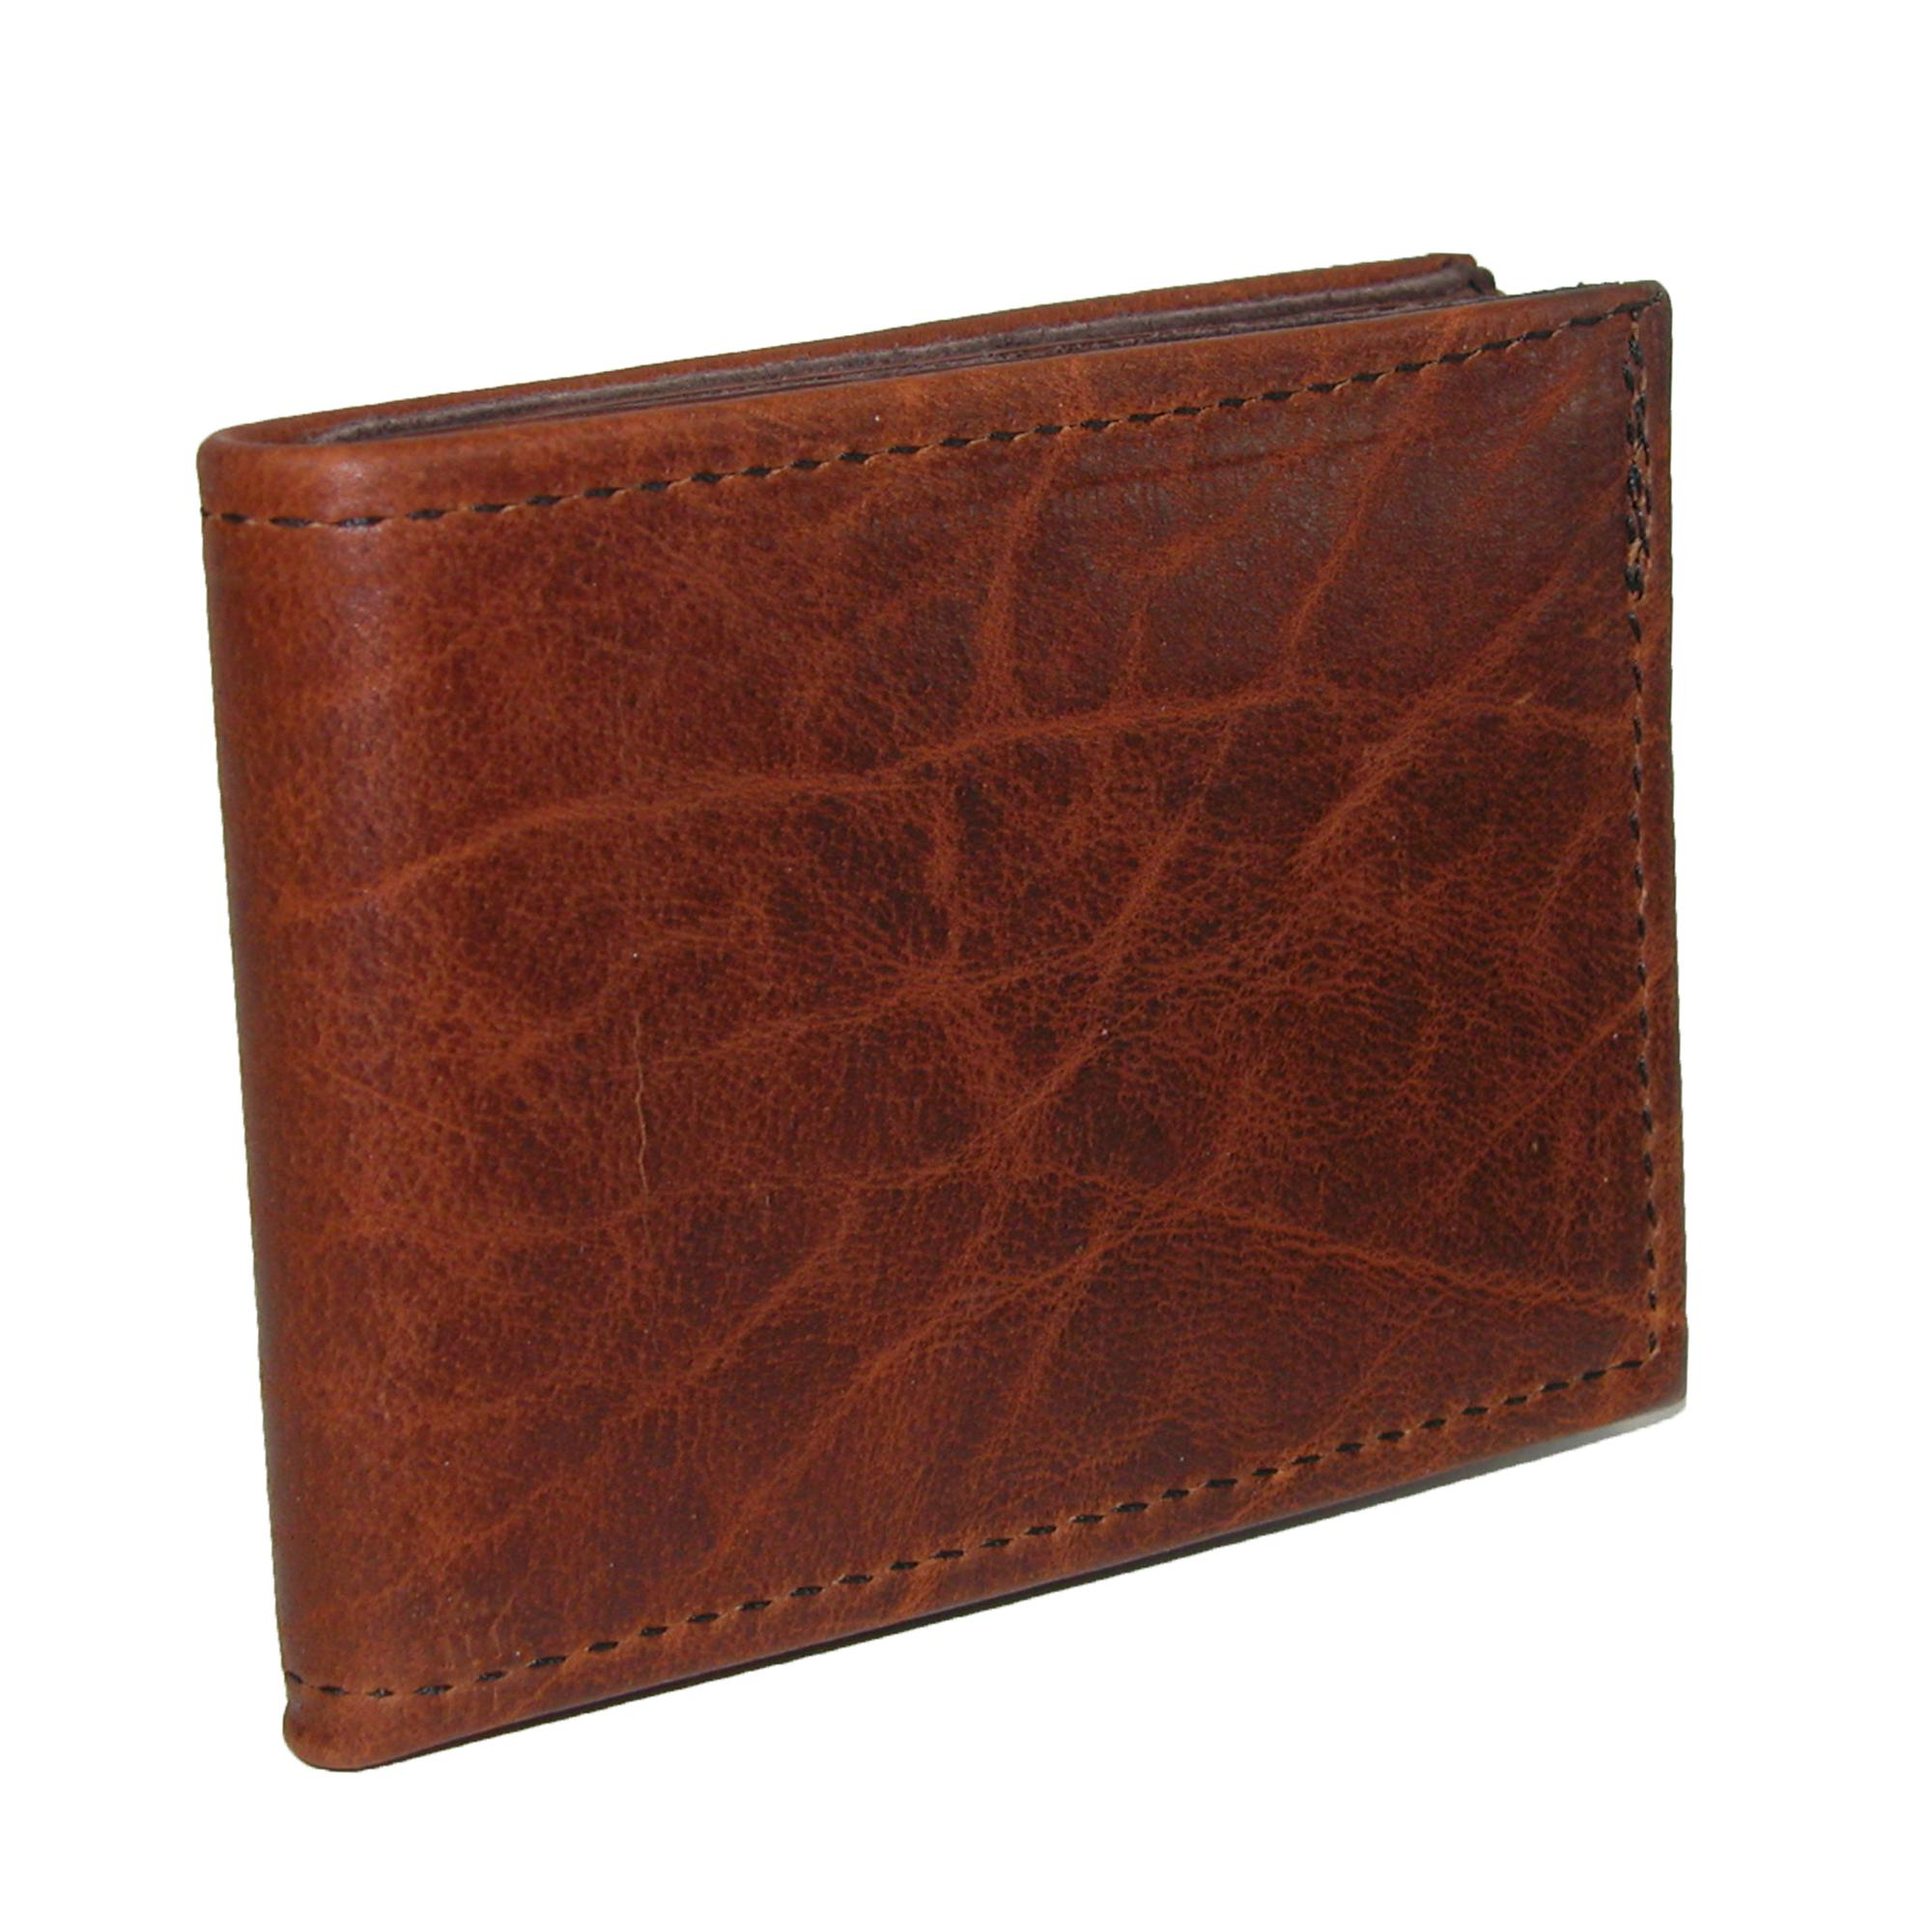 Boston Leather Men's Textured Bison Leather Billfold Wallet